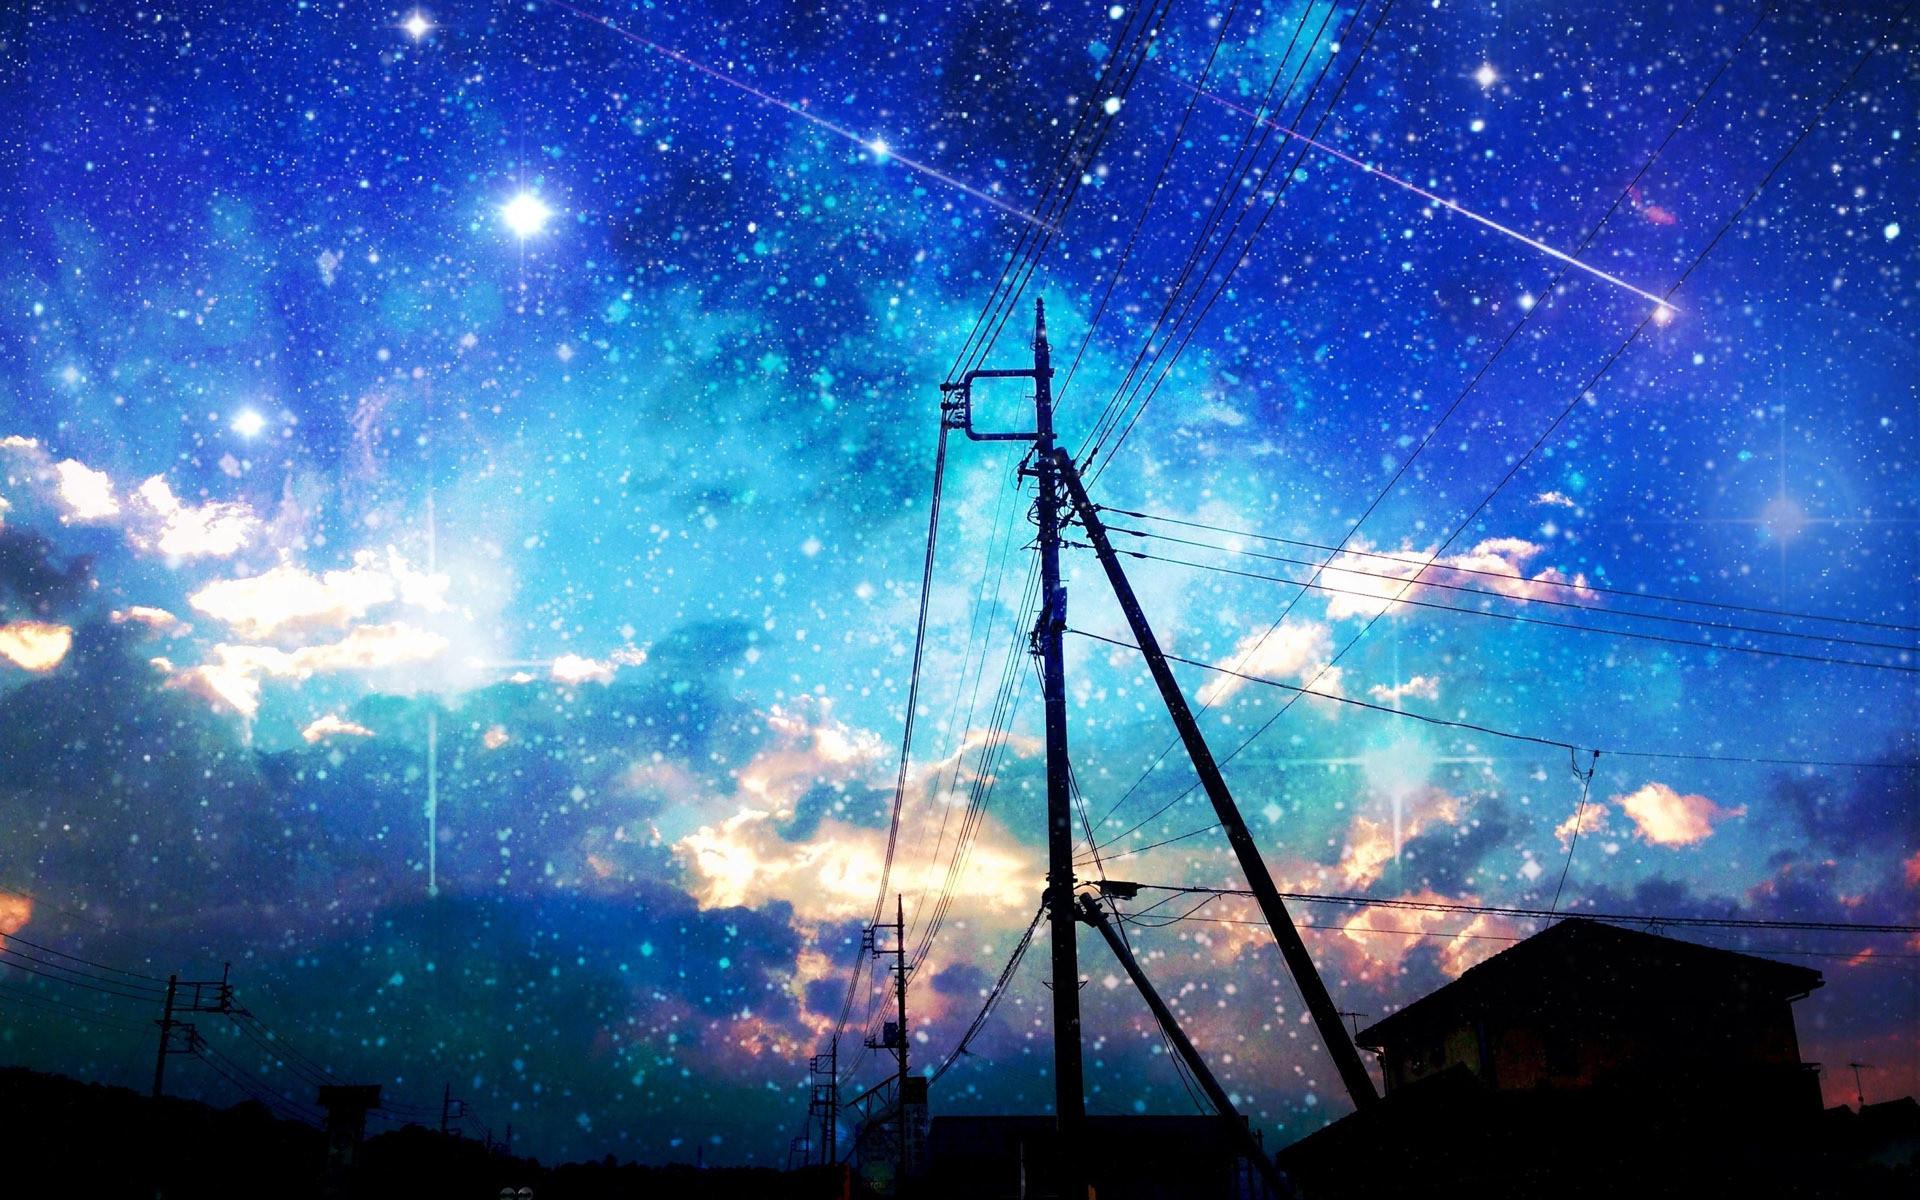 Starry Night Sky Wallpapers WallpaperPulse